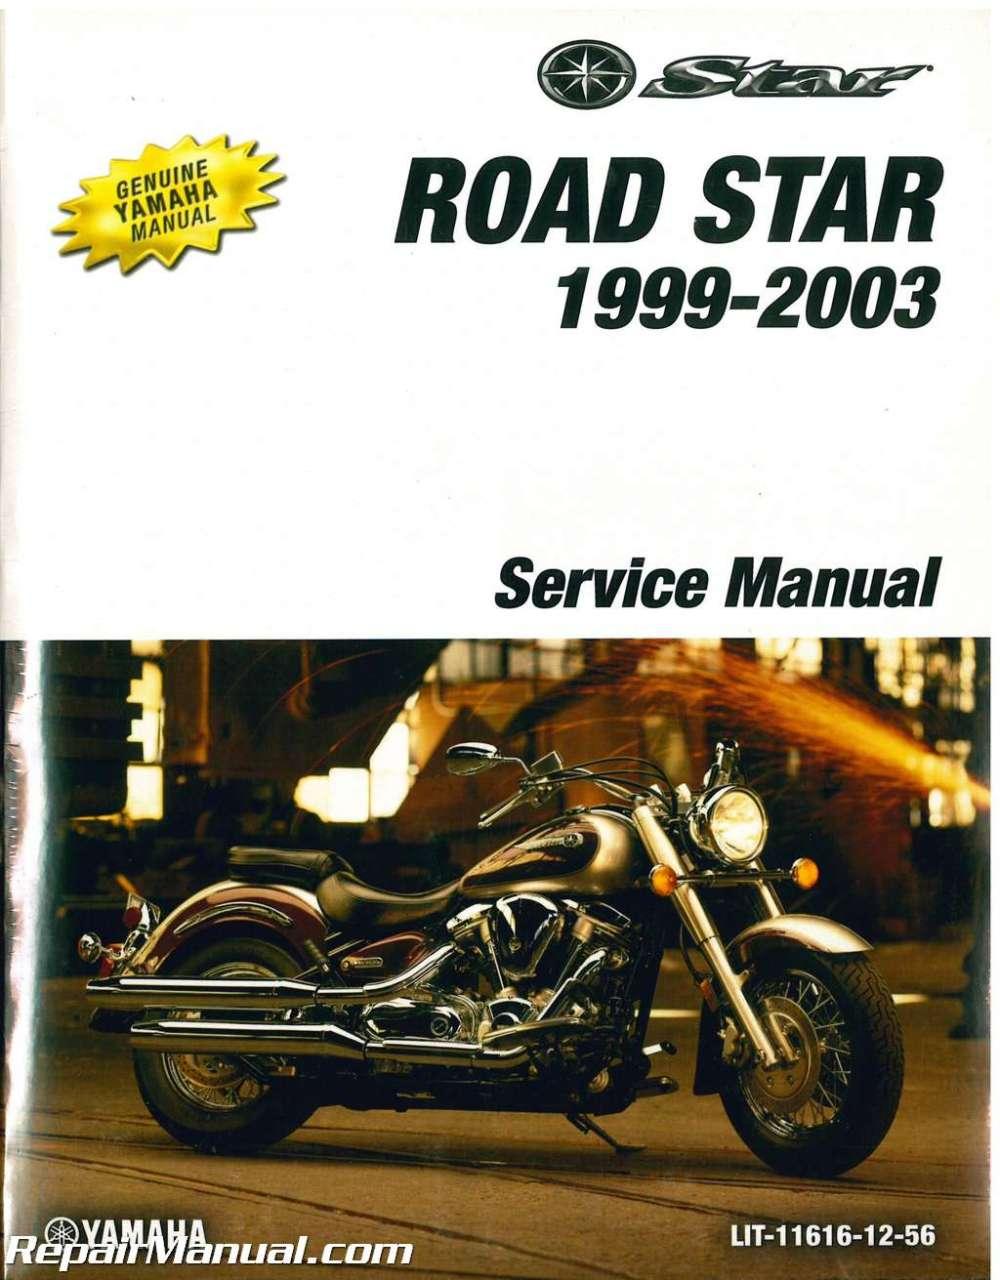 medium resolution of 1999 2003 yamaha road star xv1600 motorcycle service manual rh repairmanual com yamaha road star turn signal wiring diagram yamaha road star turn signal